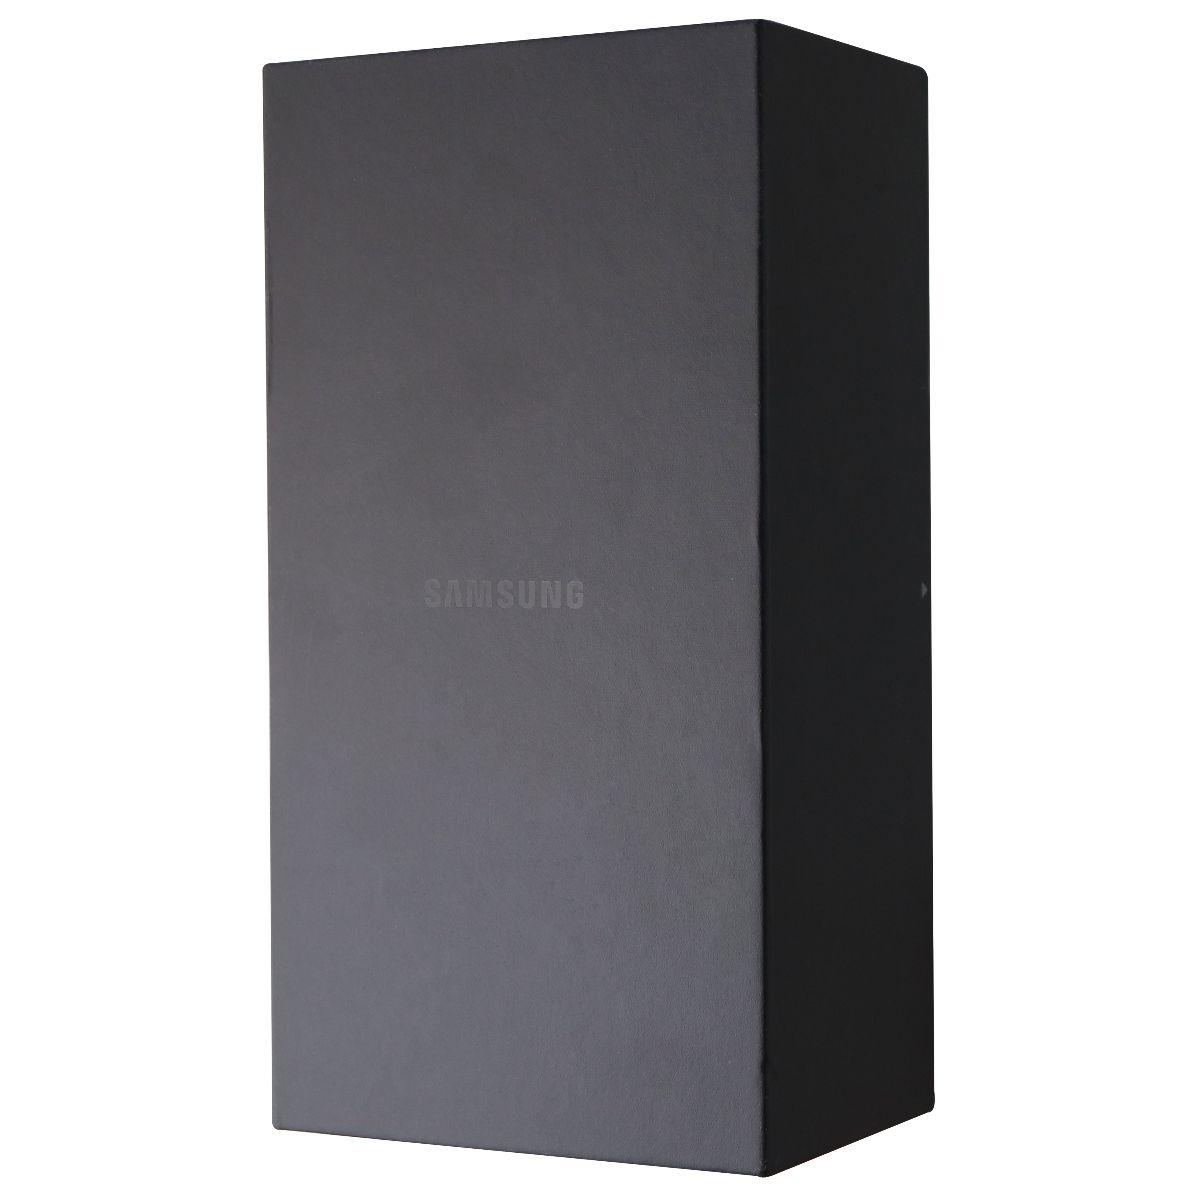 RETAIL BOX - Samsung Galaxy S9 - 64GB Blue - No Sleeve - NO DEVICE